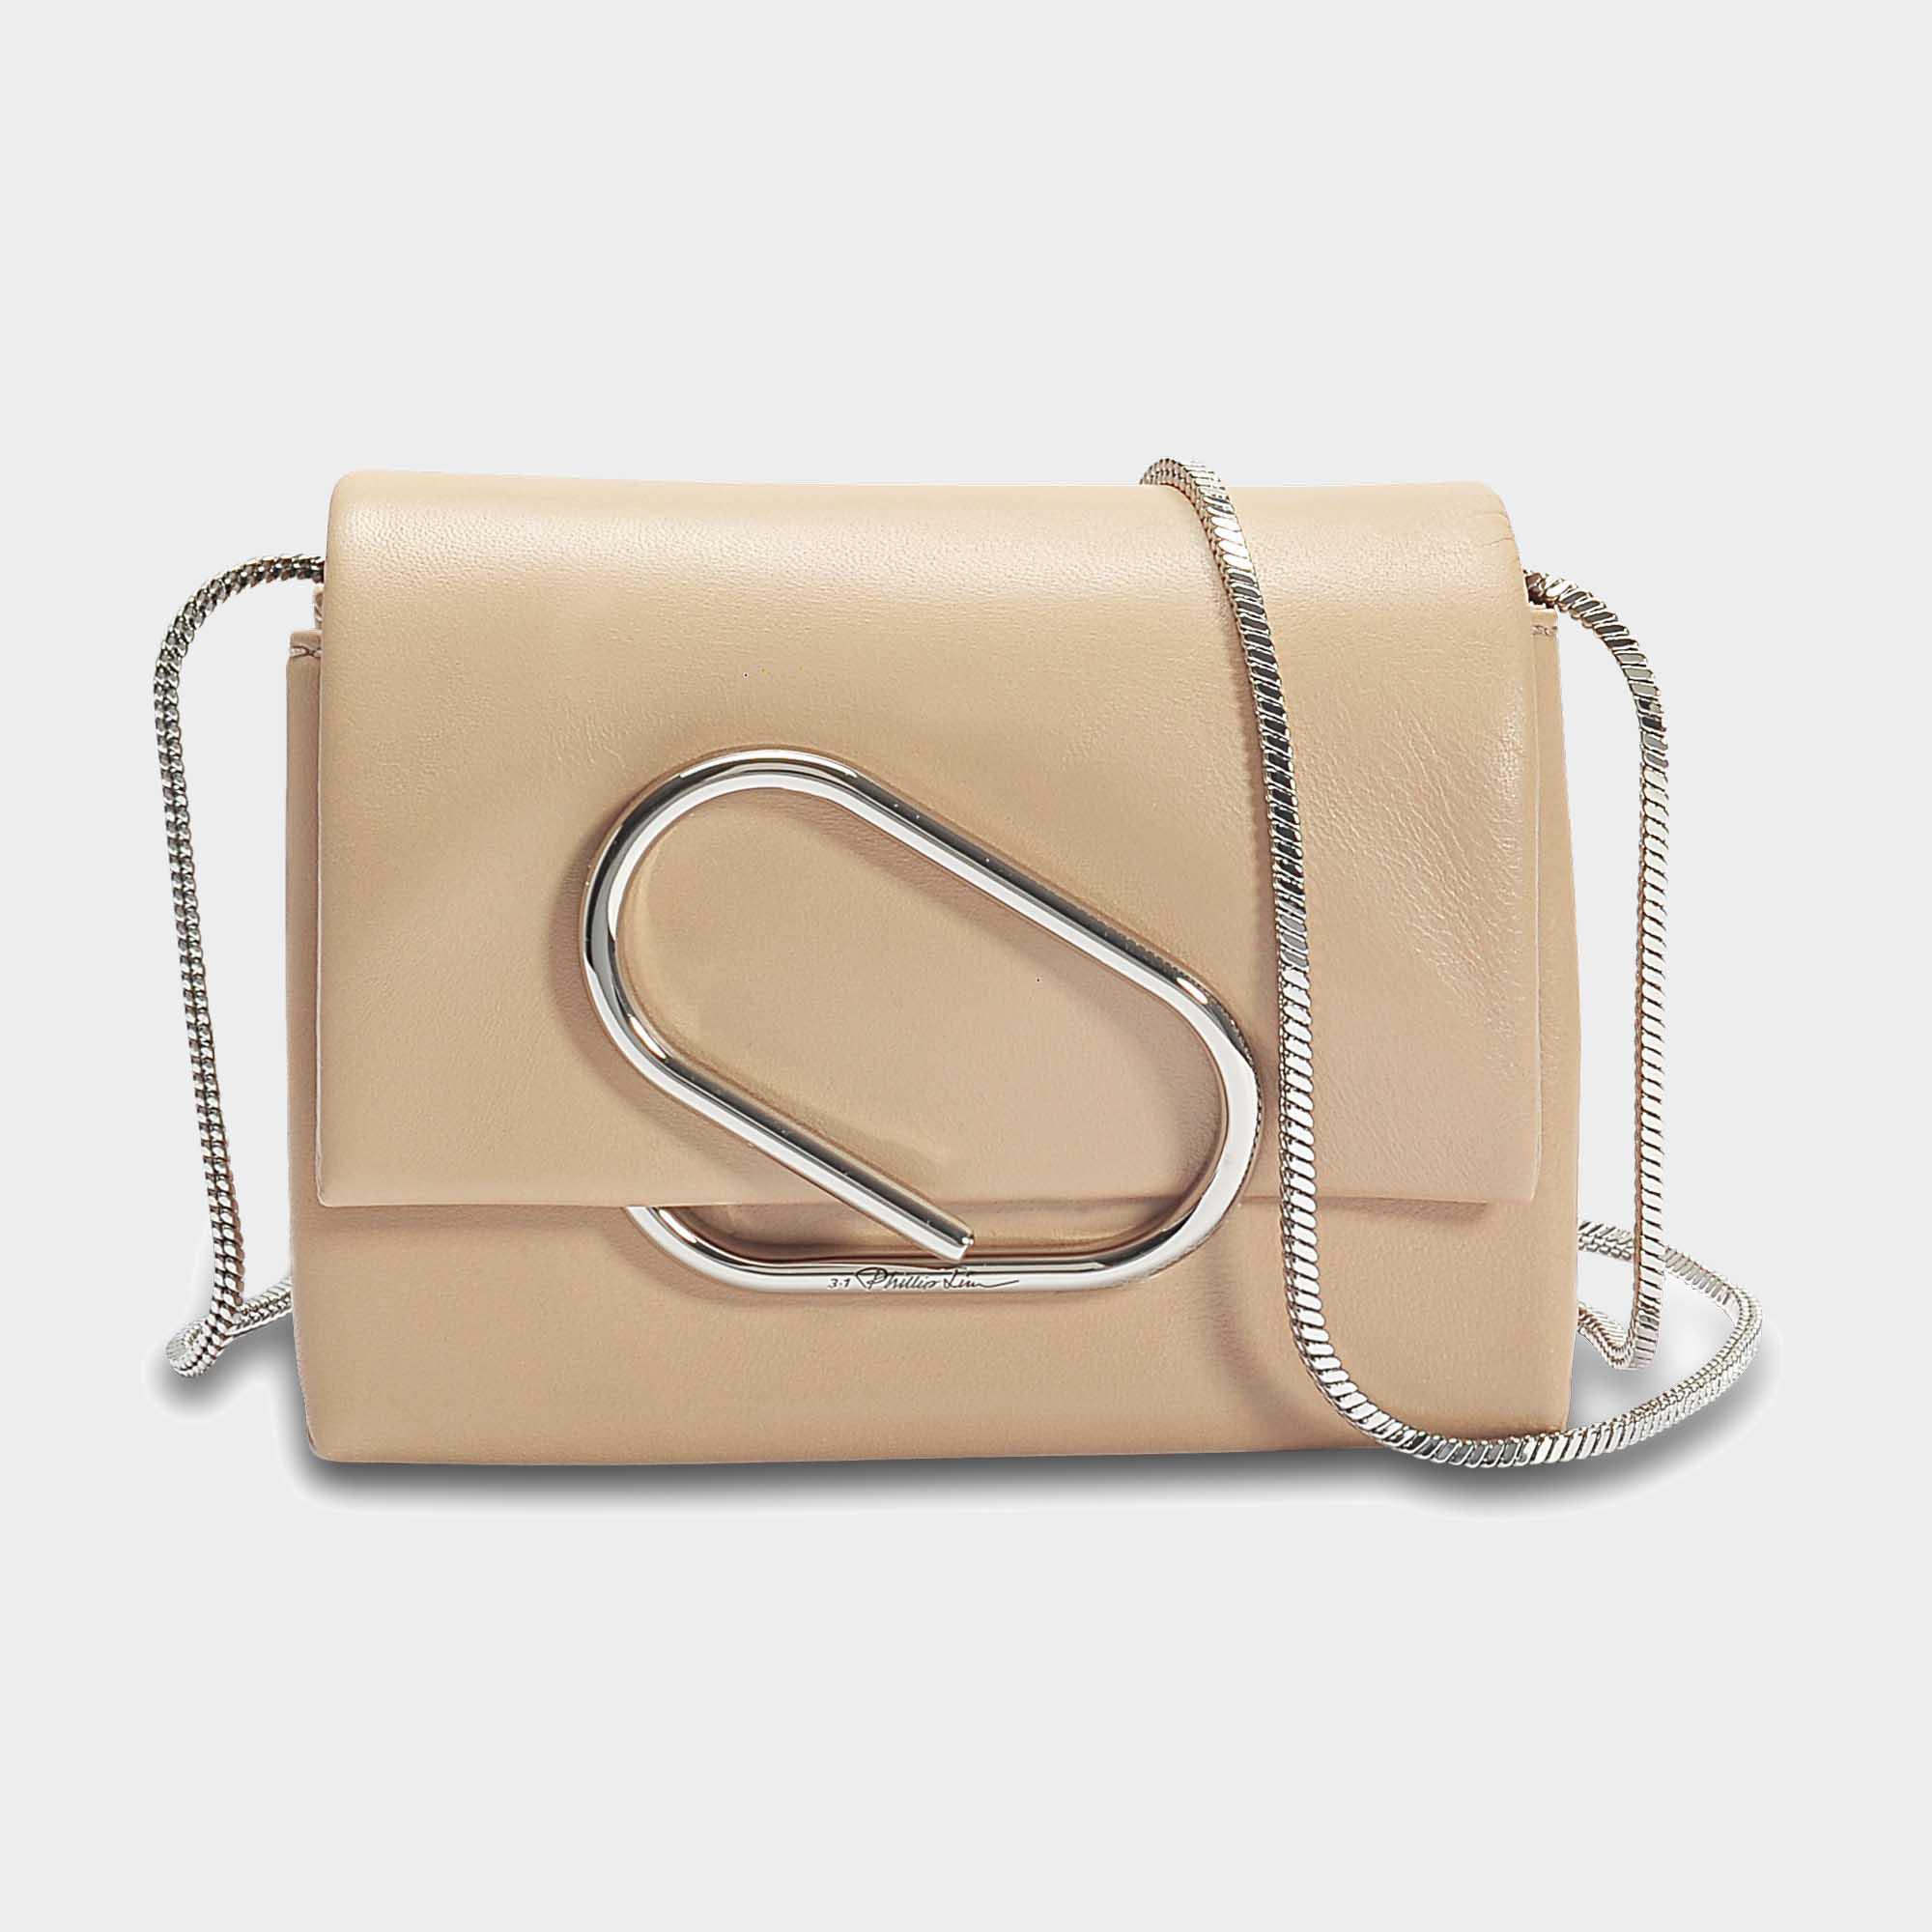 Alix Oversized Bag in Fawn Lambskin 3.1 Phillip Lim 7a0DlCJL